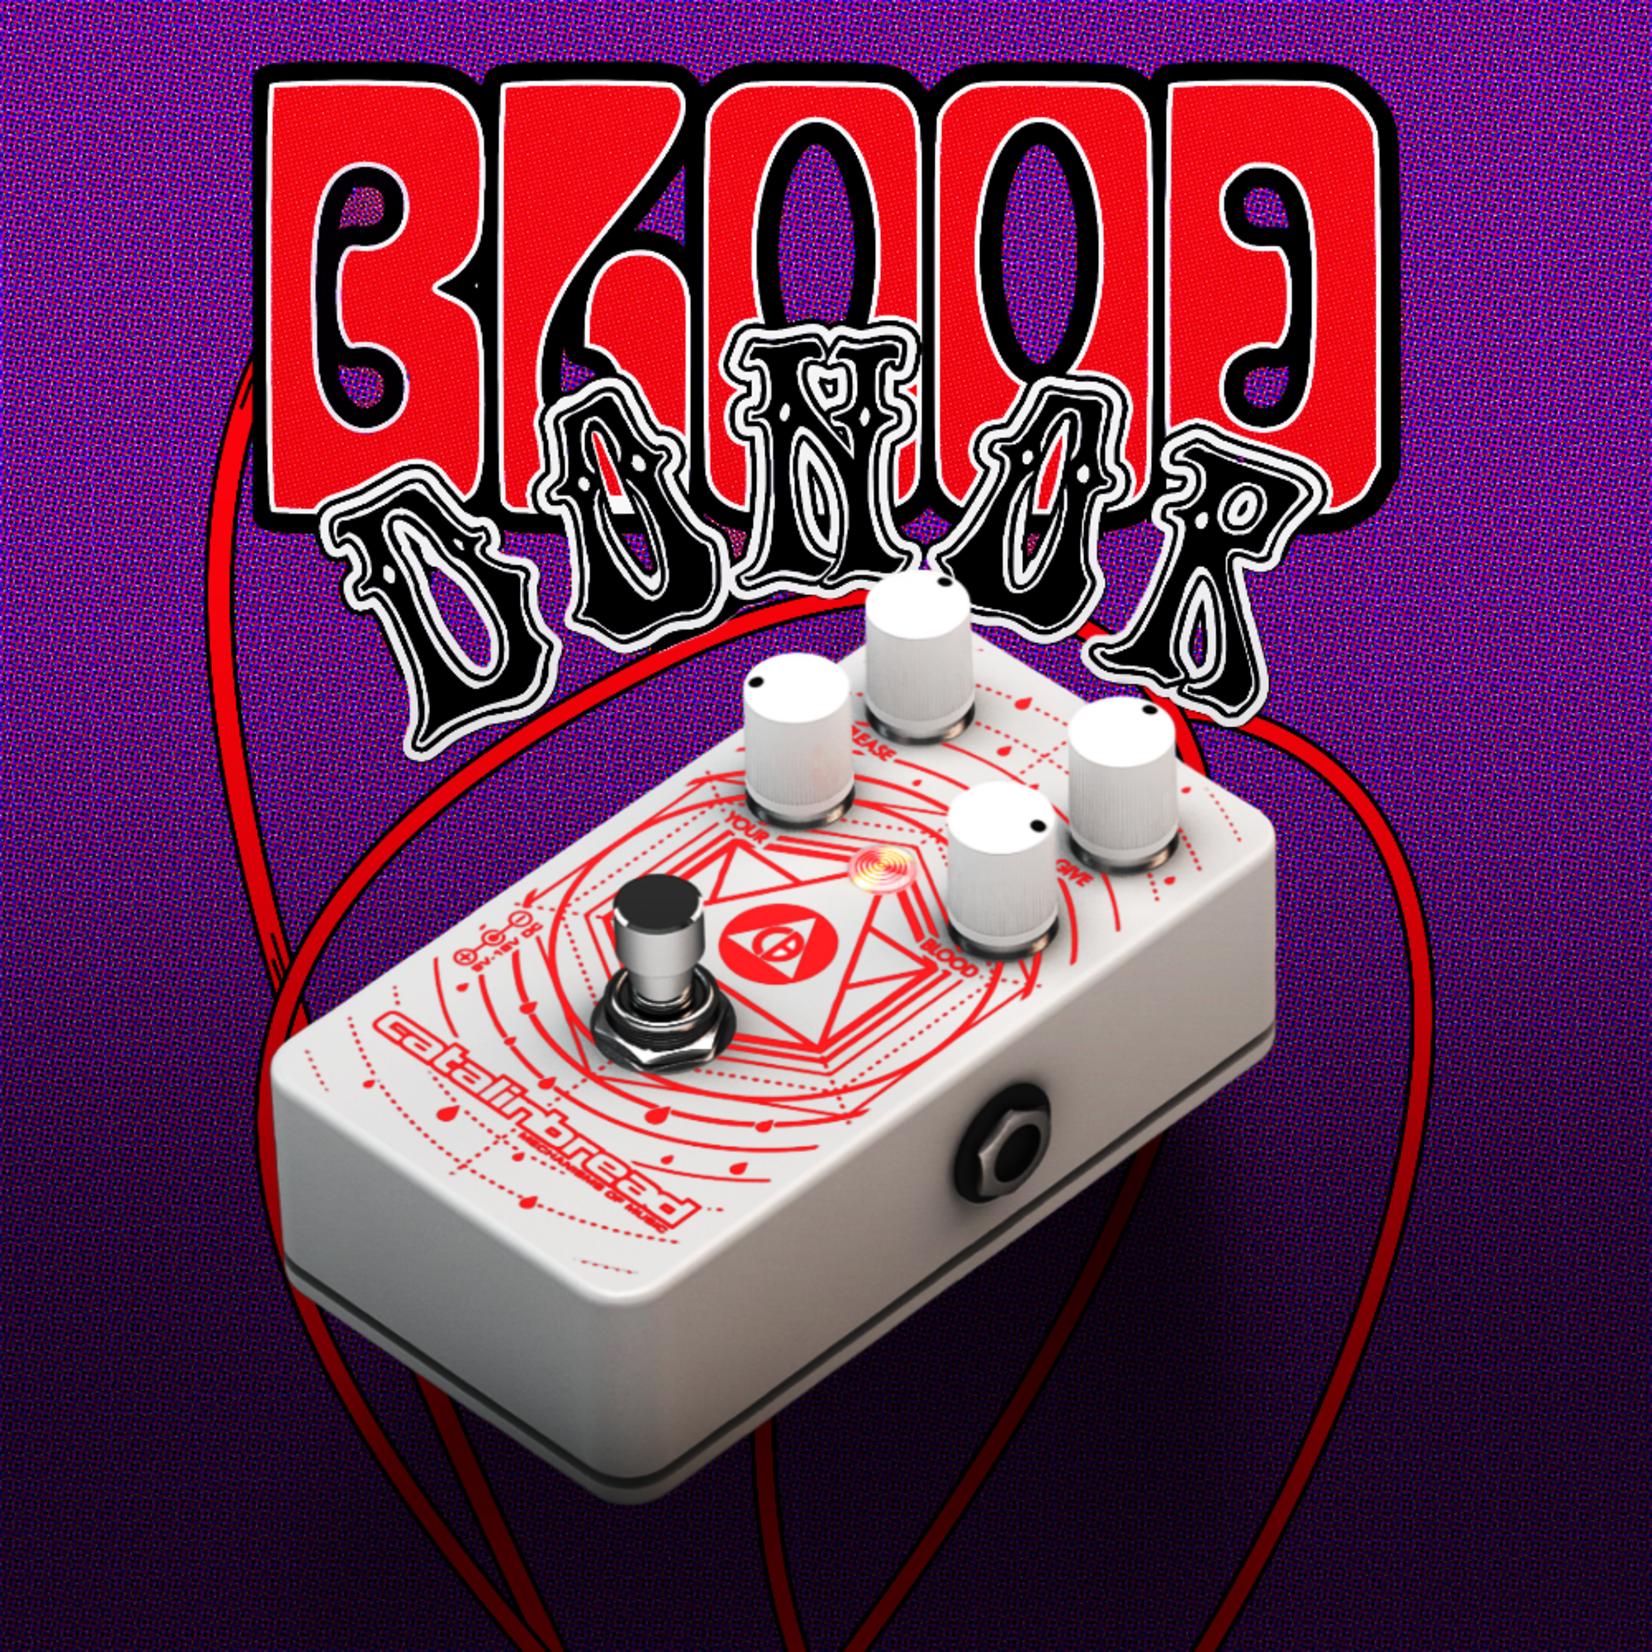 Catalinbread Catalinbread Effects Blood Donor Fuzz/Distortion, Limited Edition White